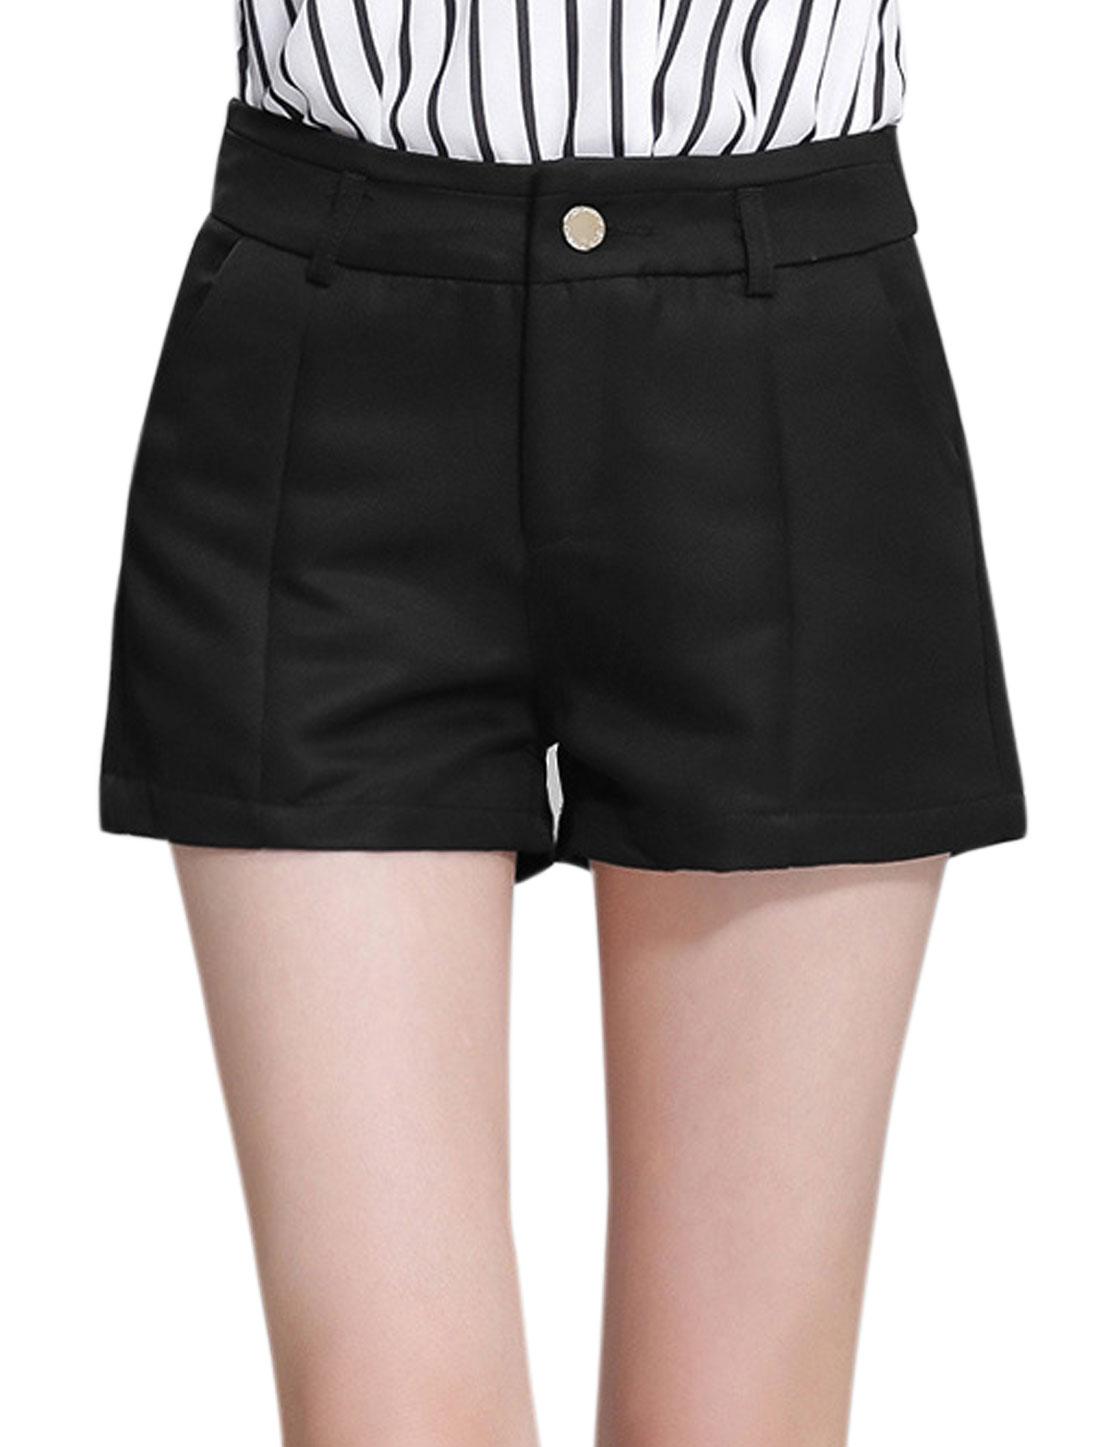 Ladies Button Closure Two Slant Pockets Casual Shorts Black L